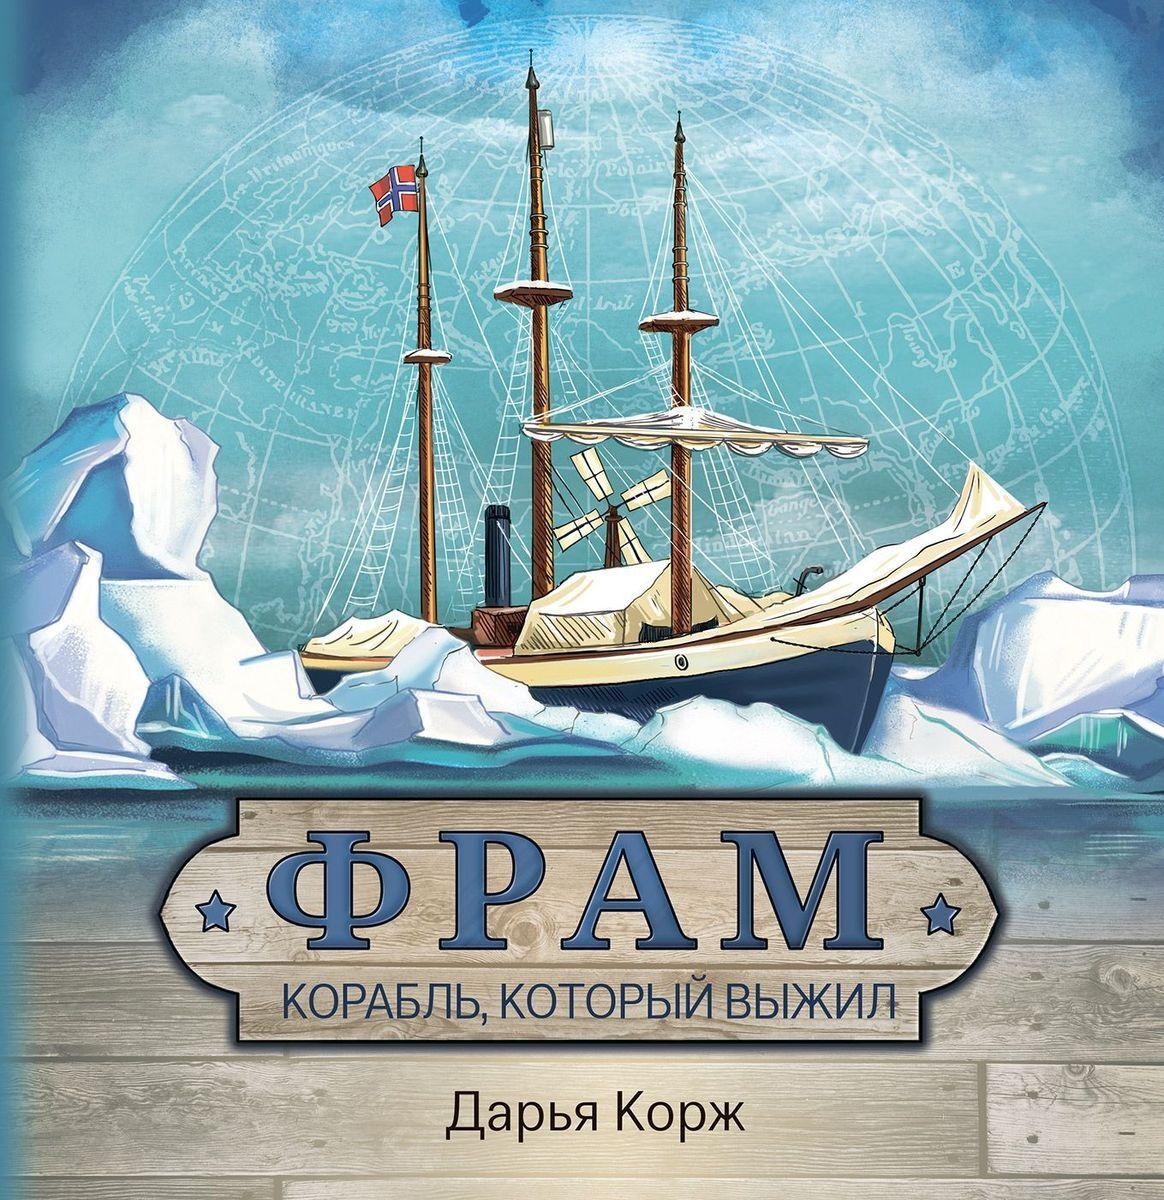 Фрам. Корабль, который выжил | Корж Дарья